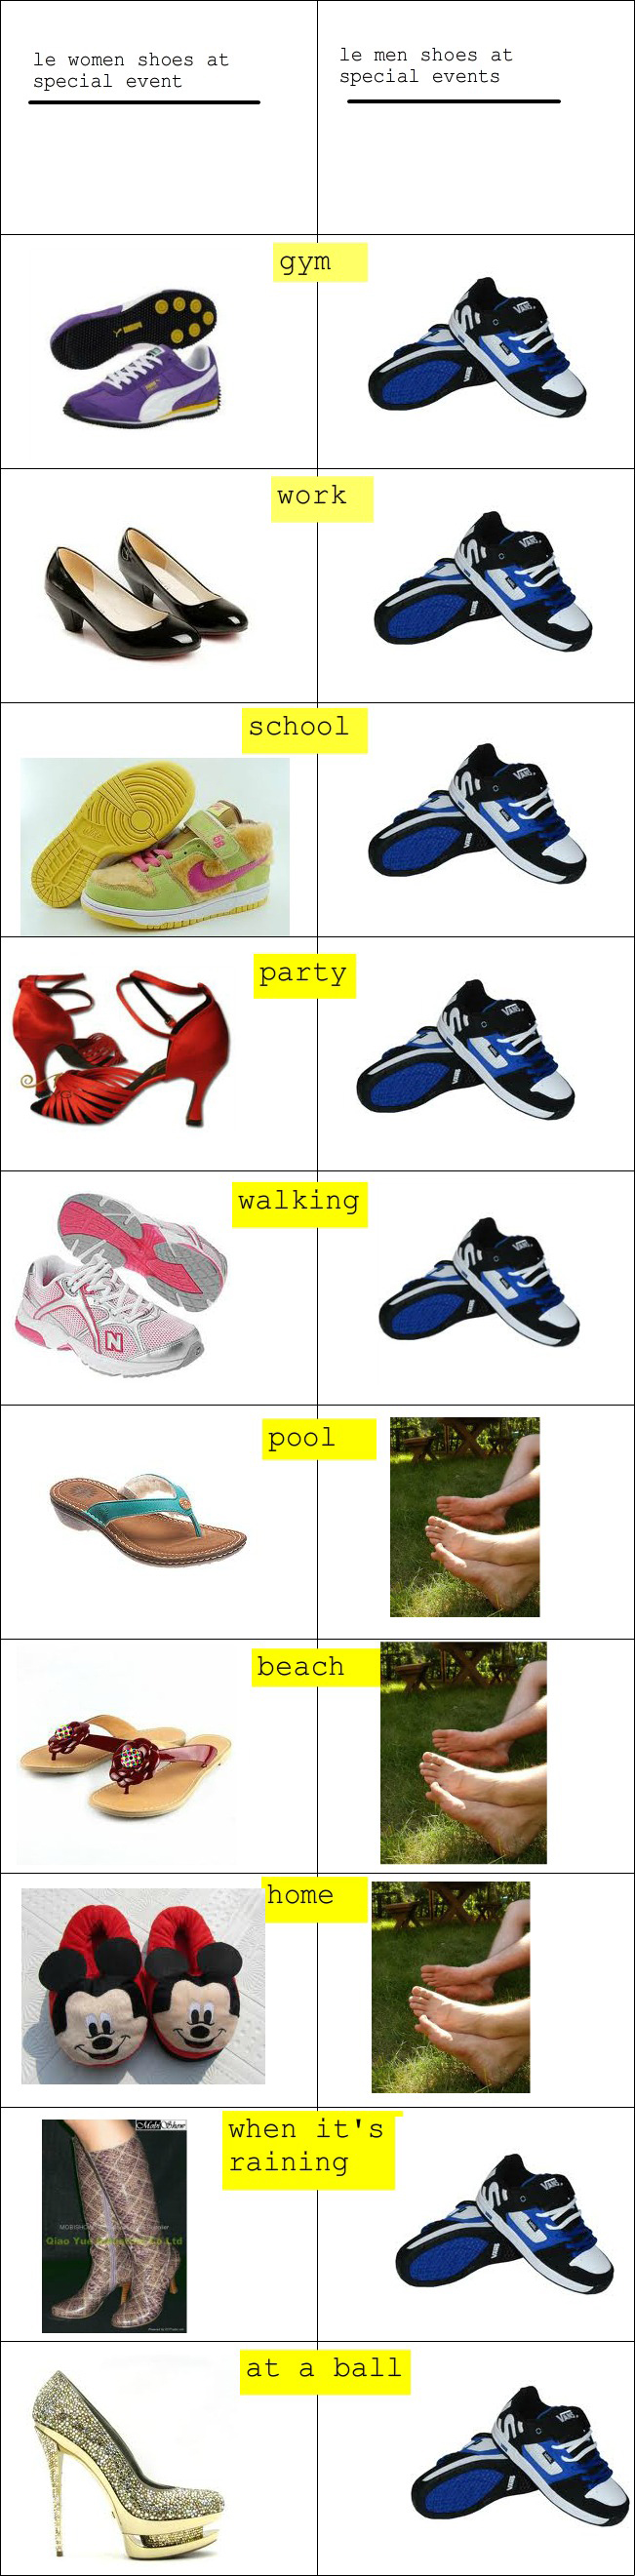 Preparing Shoes For Special Events - Men vs. Women